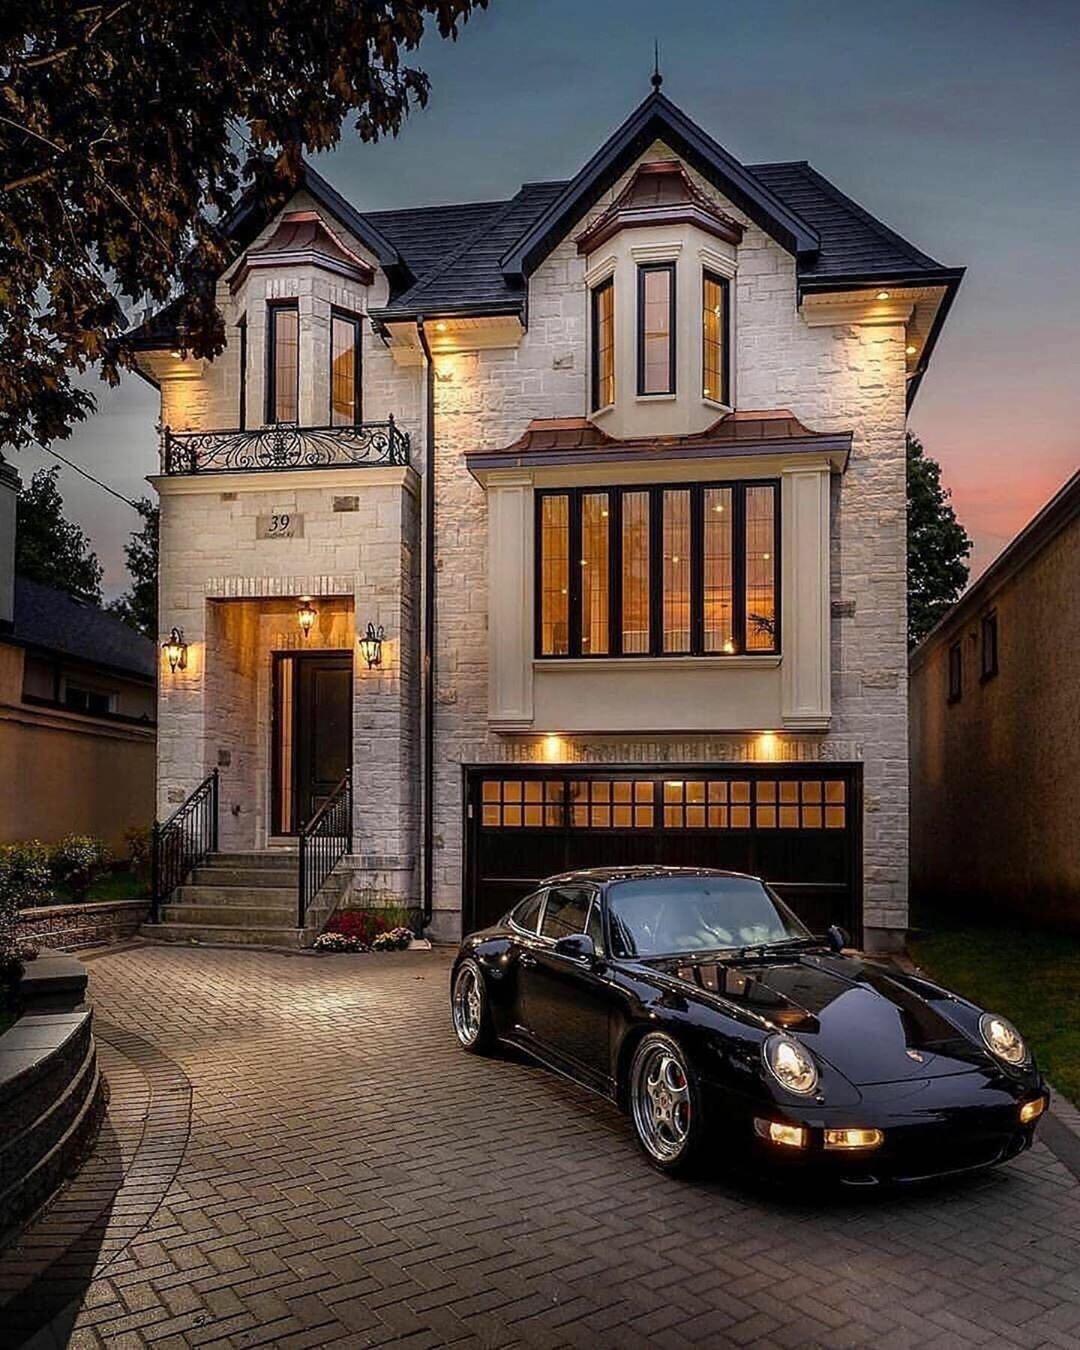 только картинки дорогих машин и квартир даже металле